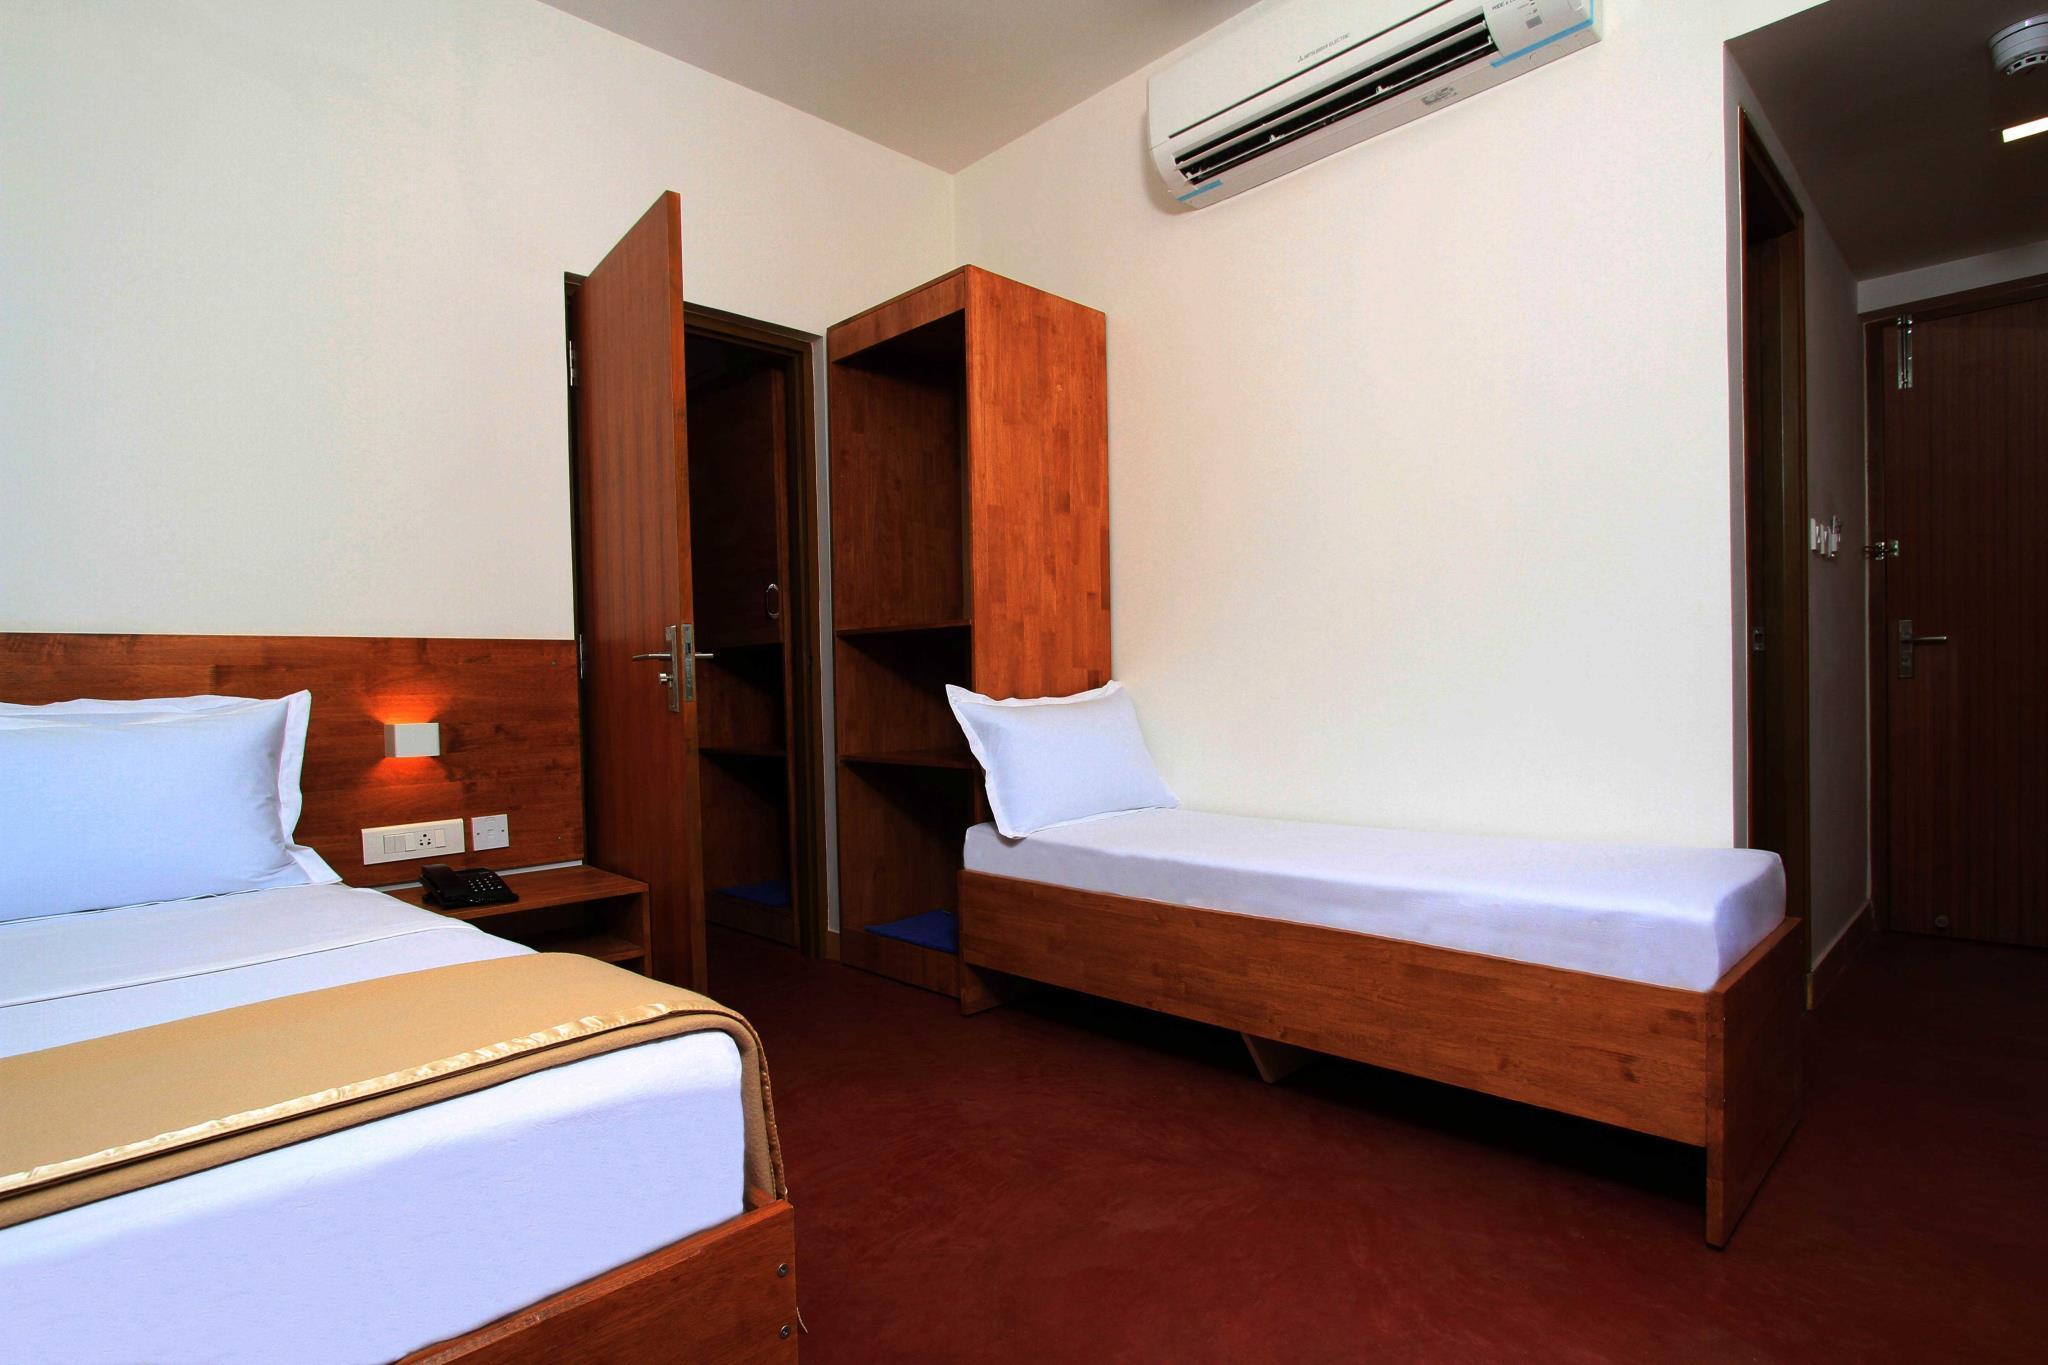 Review Hotel Dwara, Kukke Subrahmanya